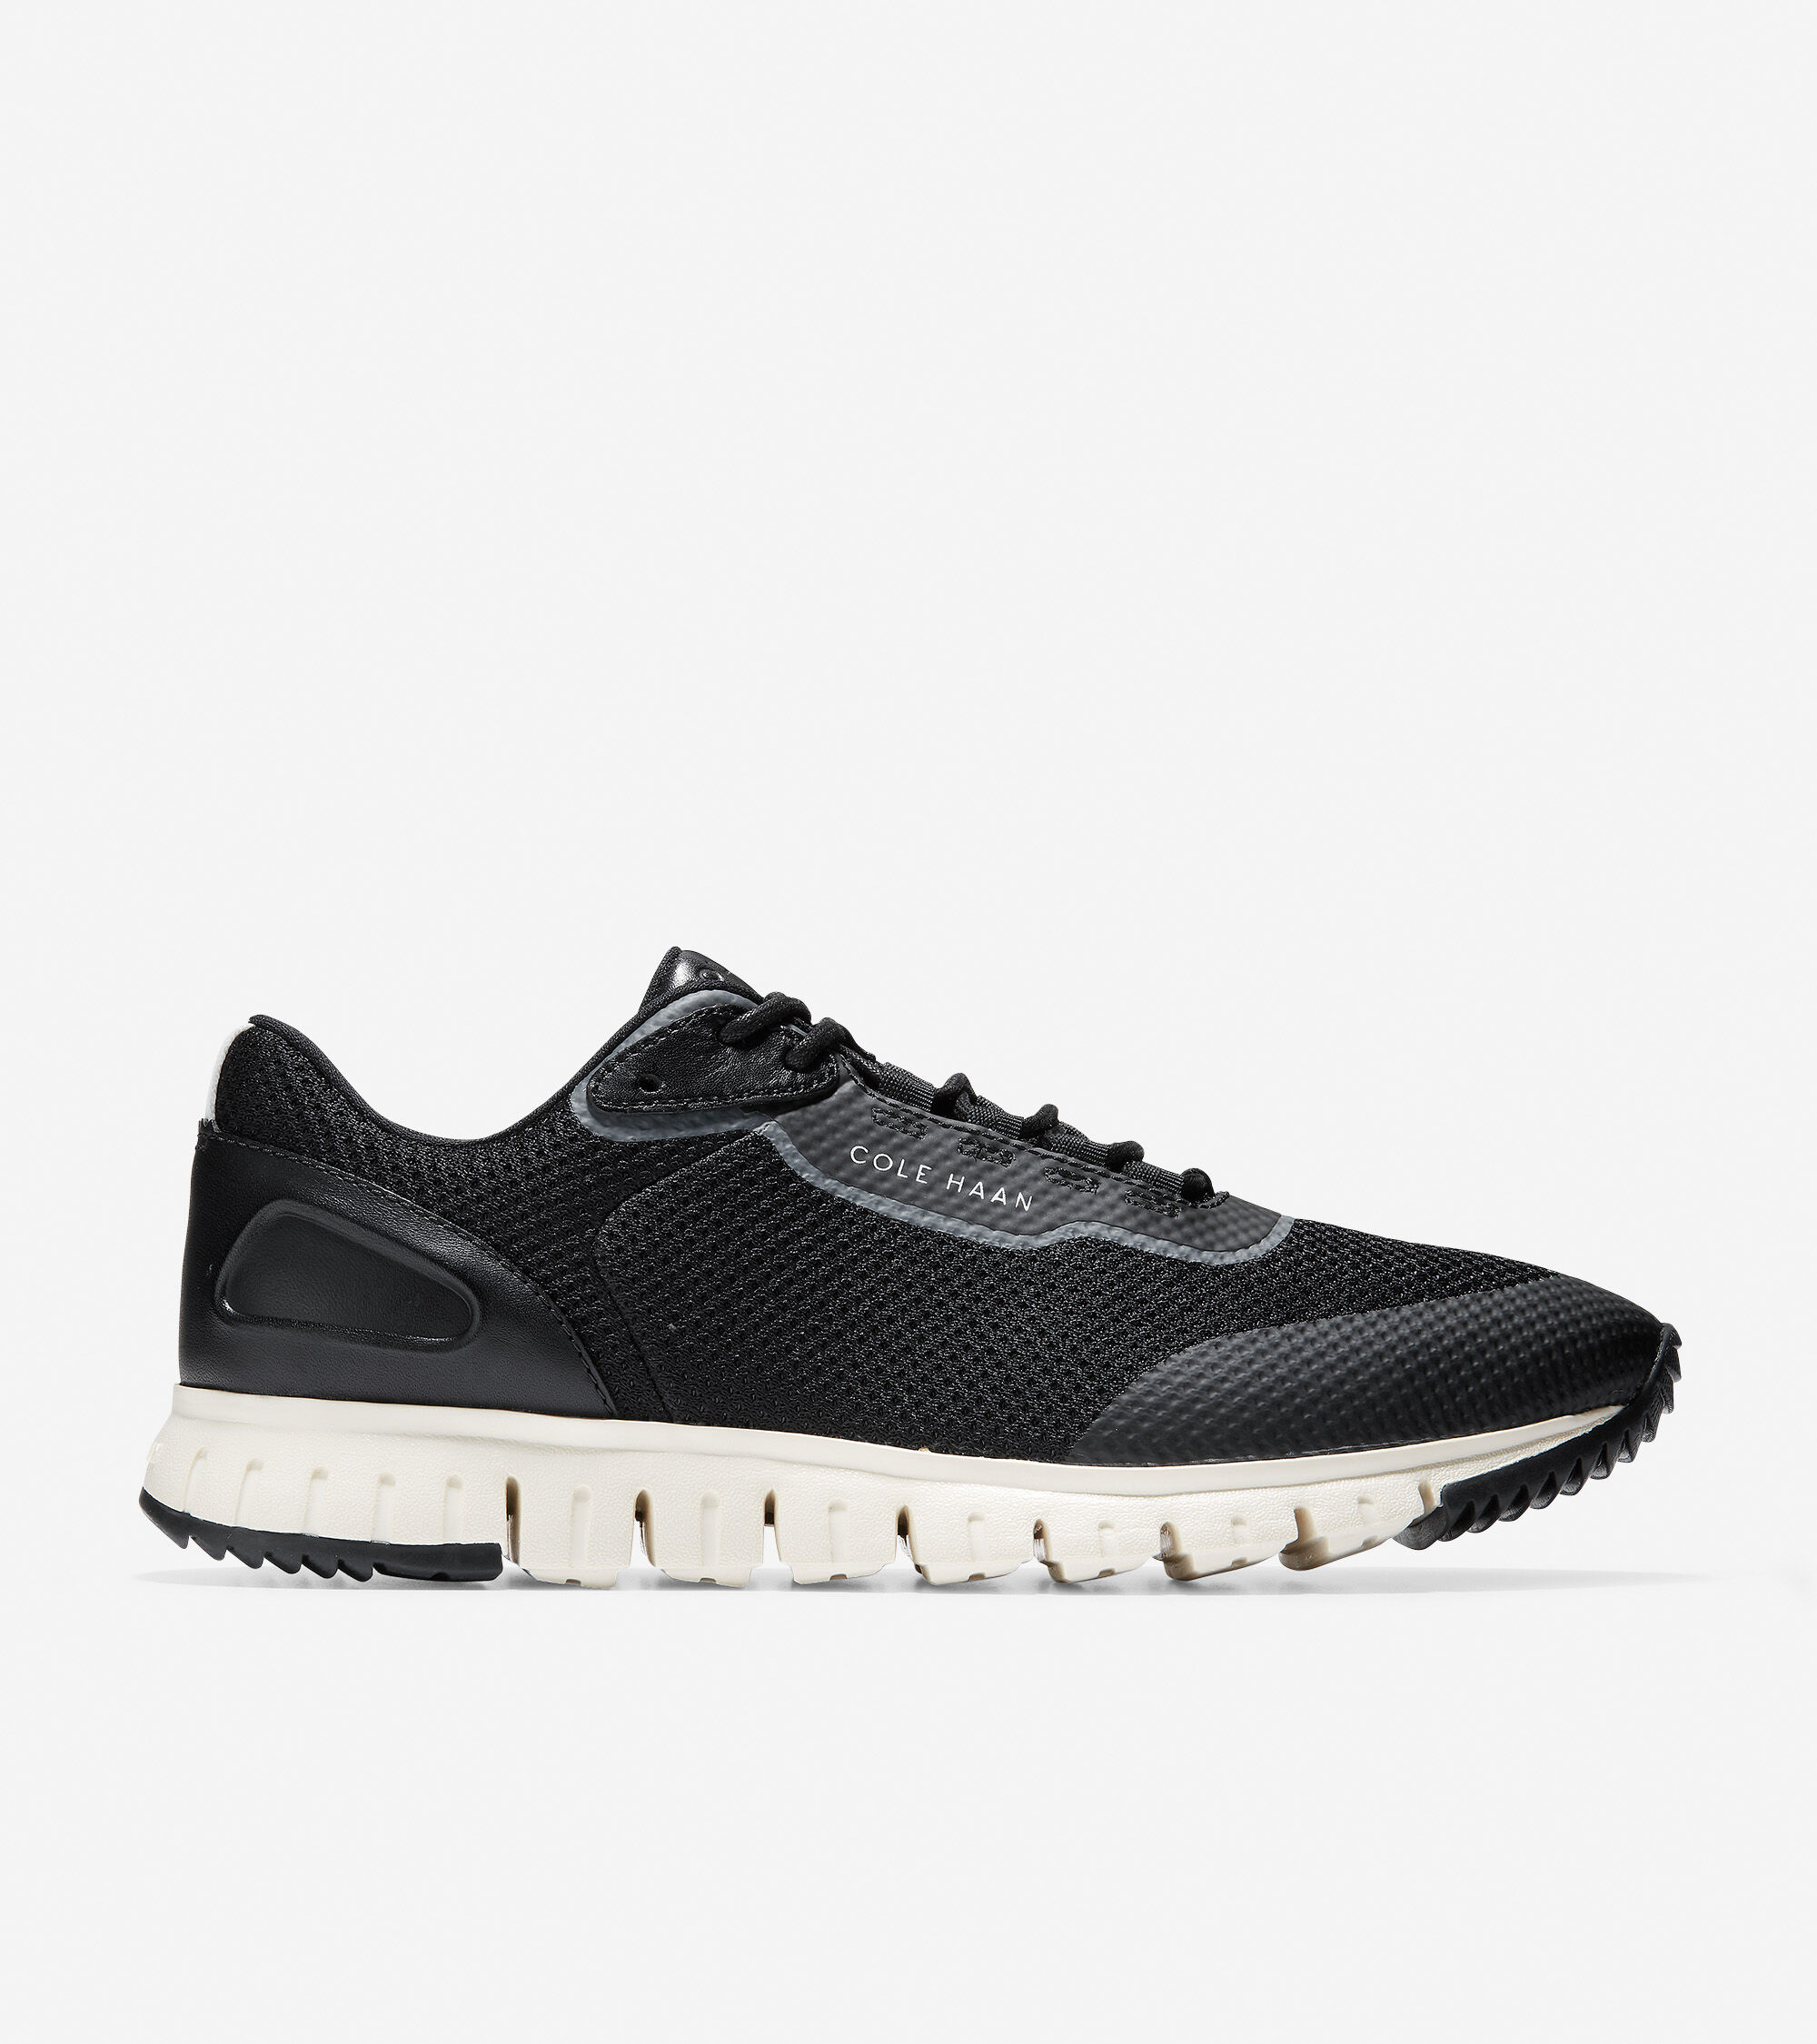 Men's Grandsport Flex Sneaker in Black